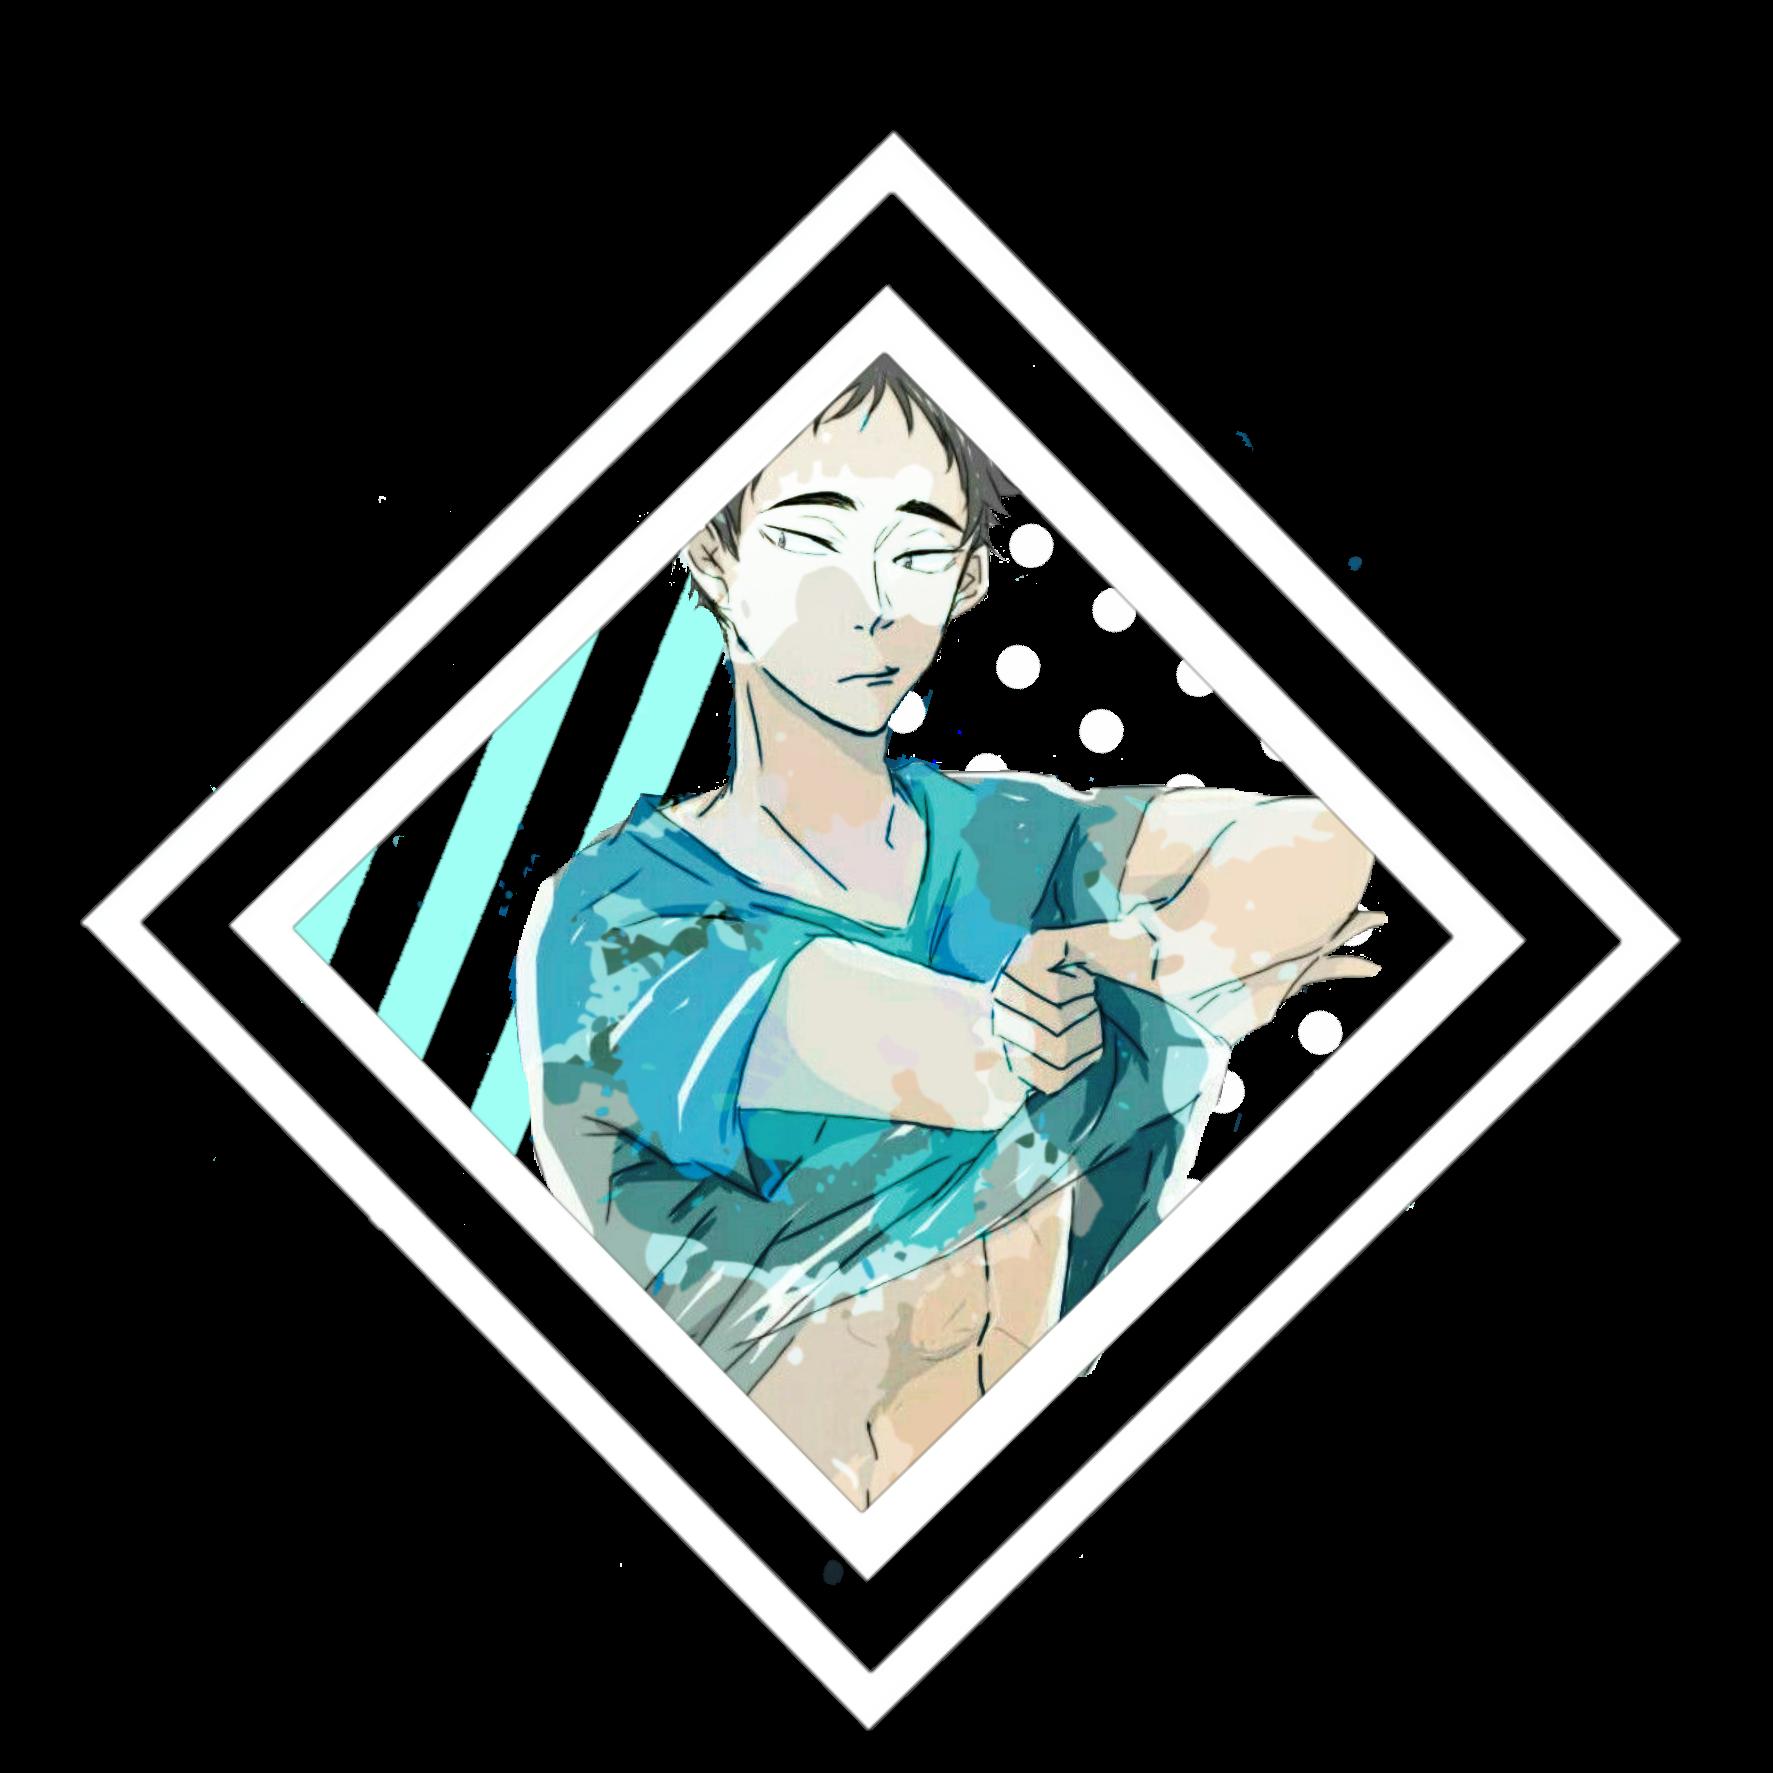 Freetoeditmatsukawa Issei Icon Remixit In 2020 Matsukawa Issei Shiratorizawa Haikyuu